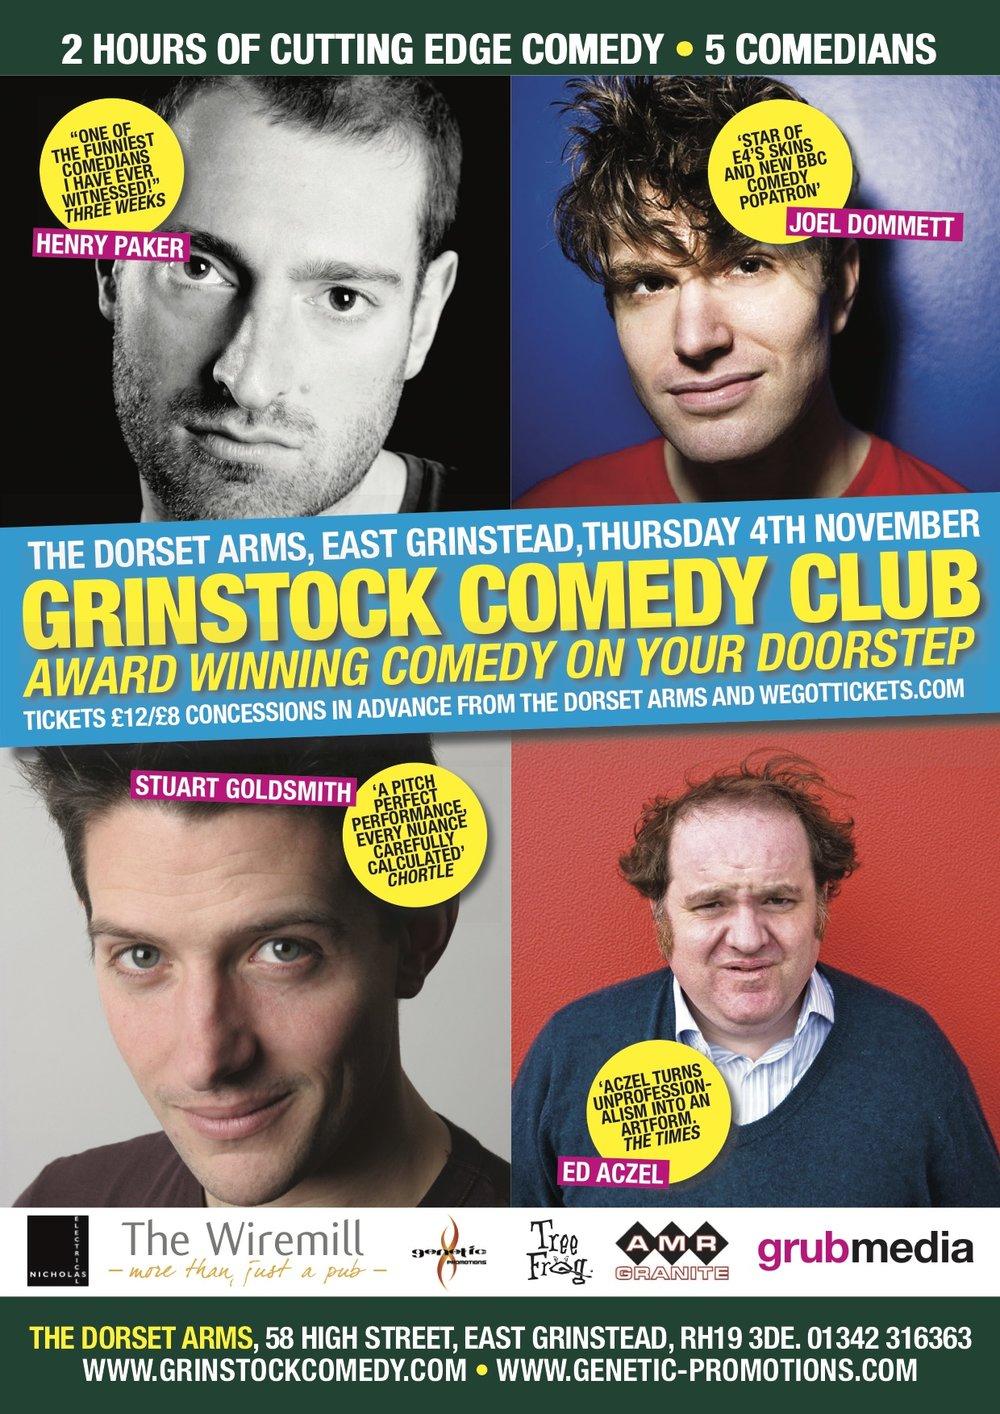 grinstock-comdey-november-2010.jpg